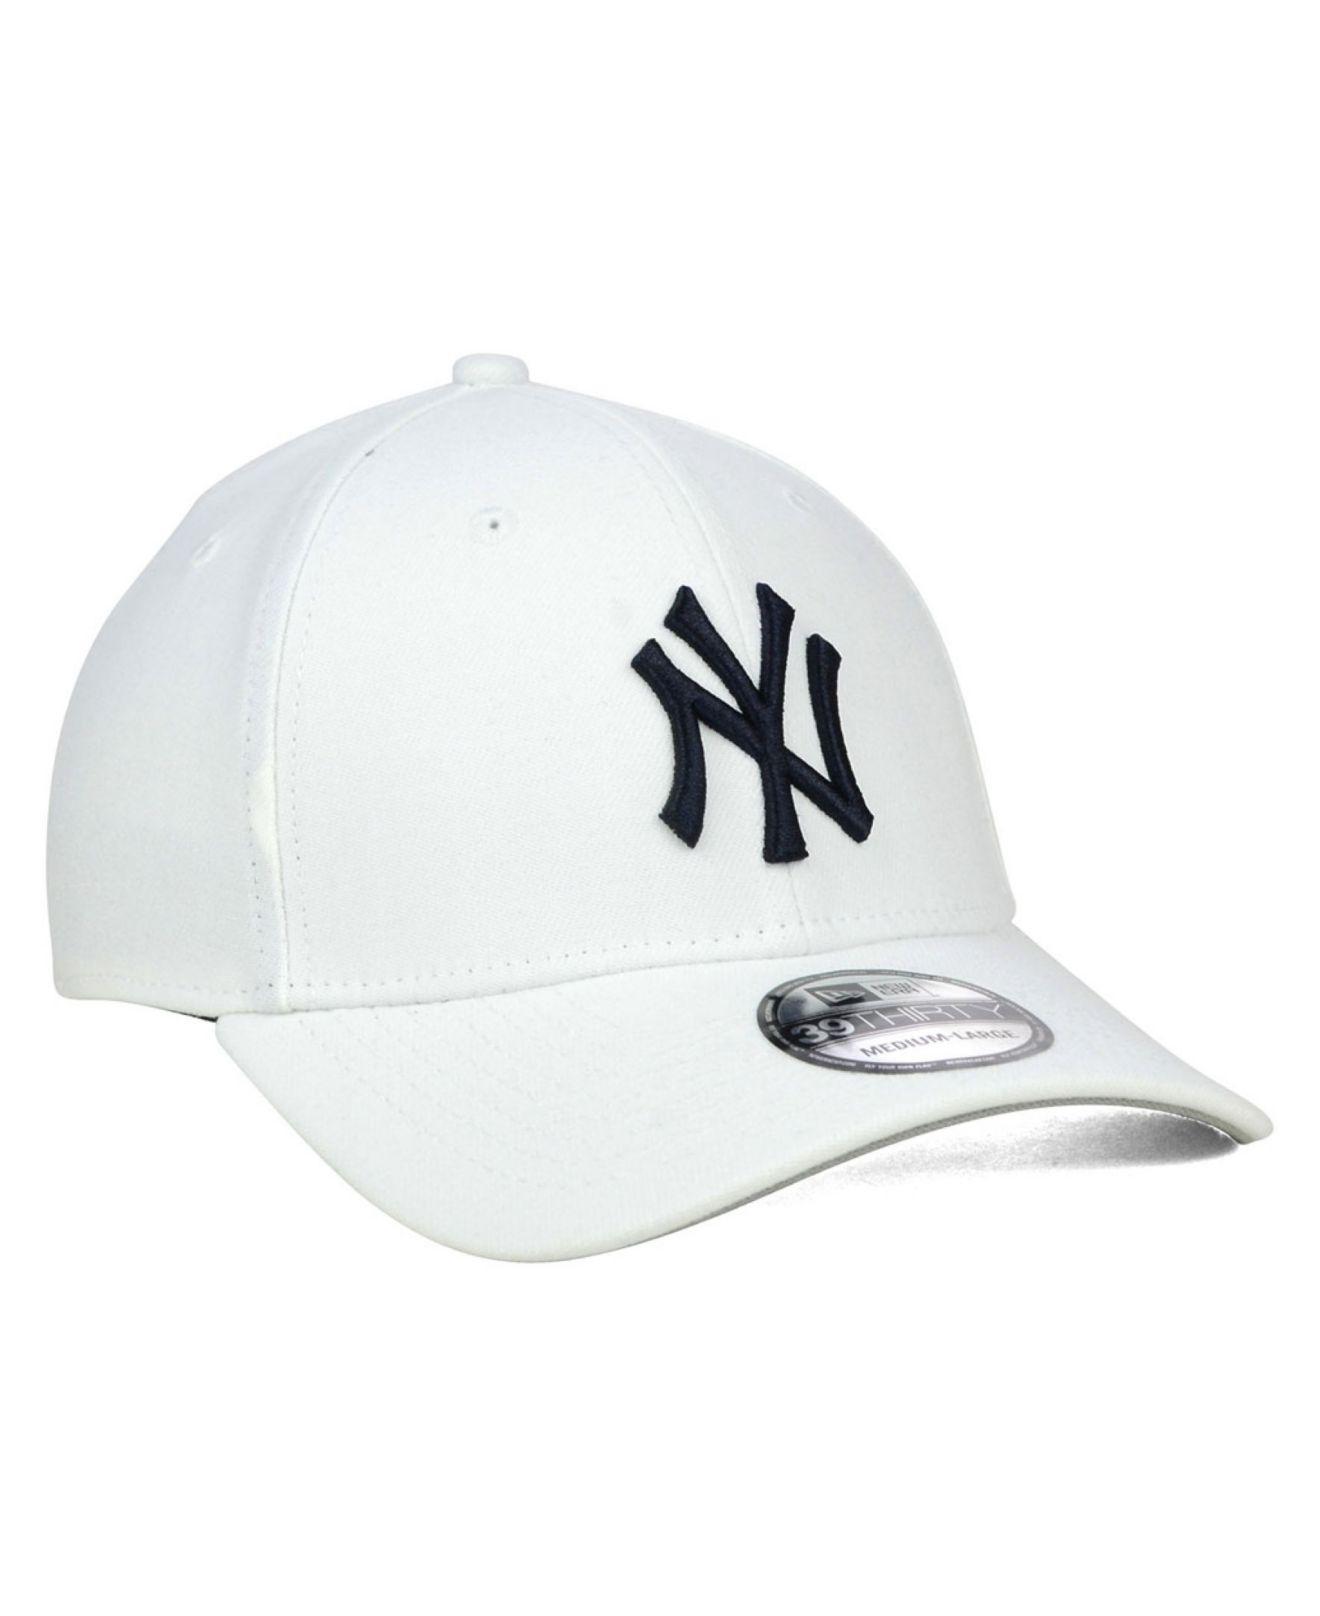 d26bc80abb7841 ... coupon code for new york yankees core classic 39thirty cap for men lyst.  view fullscreen